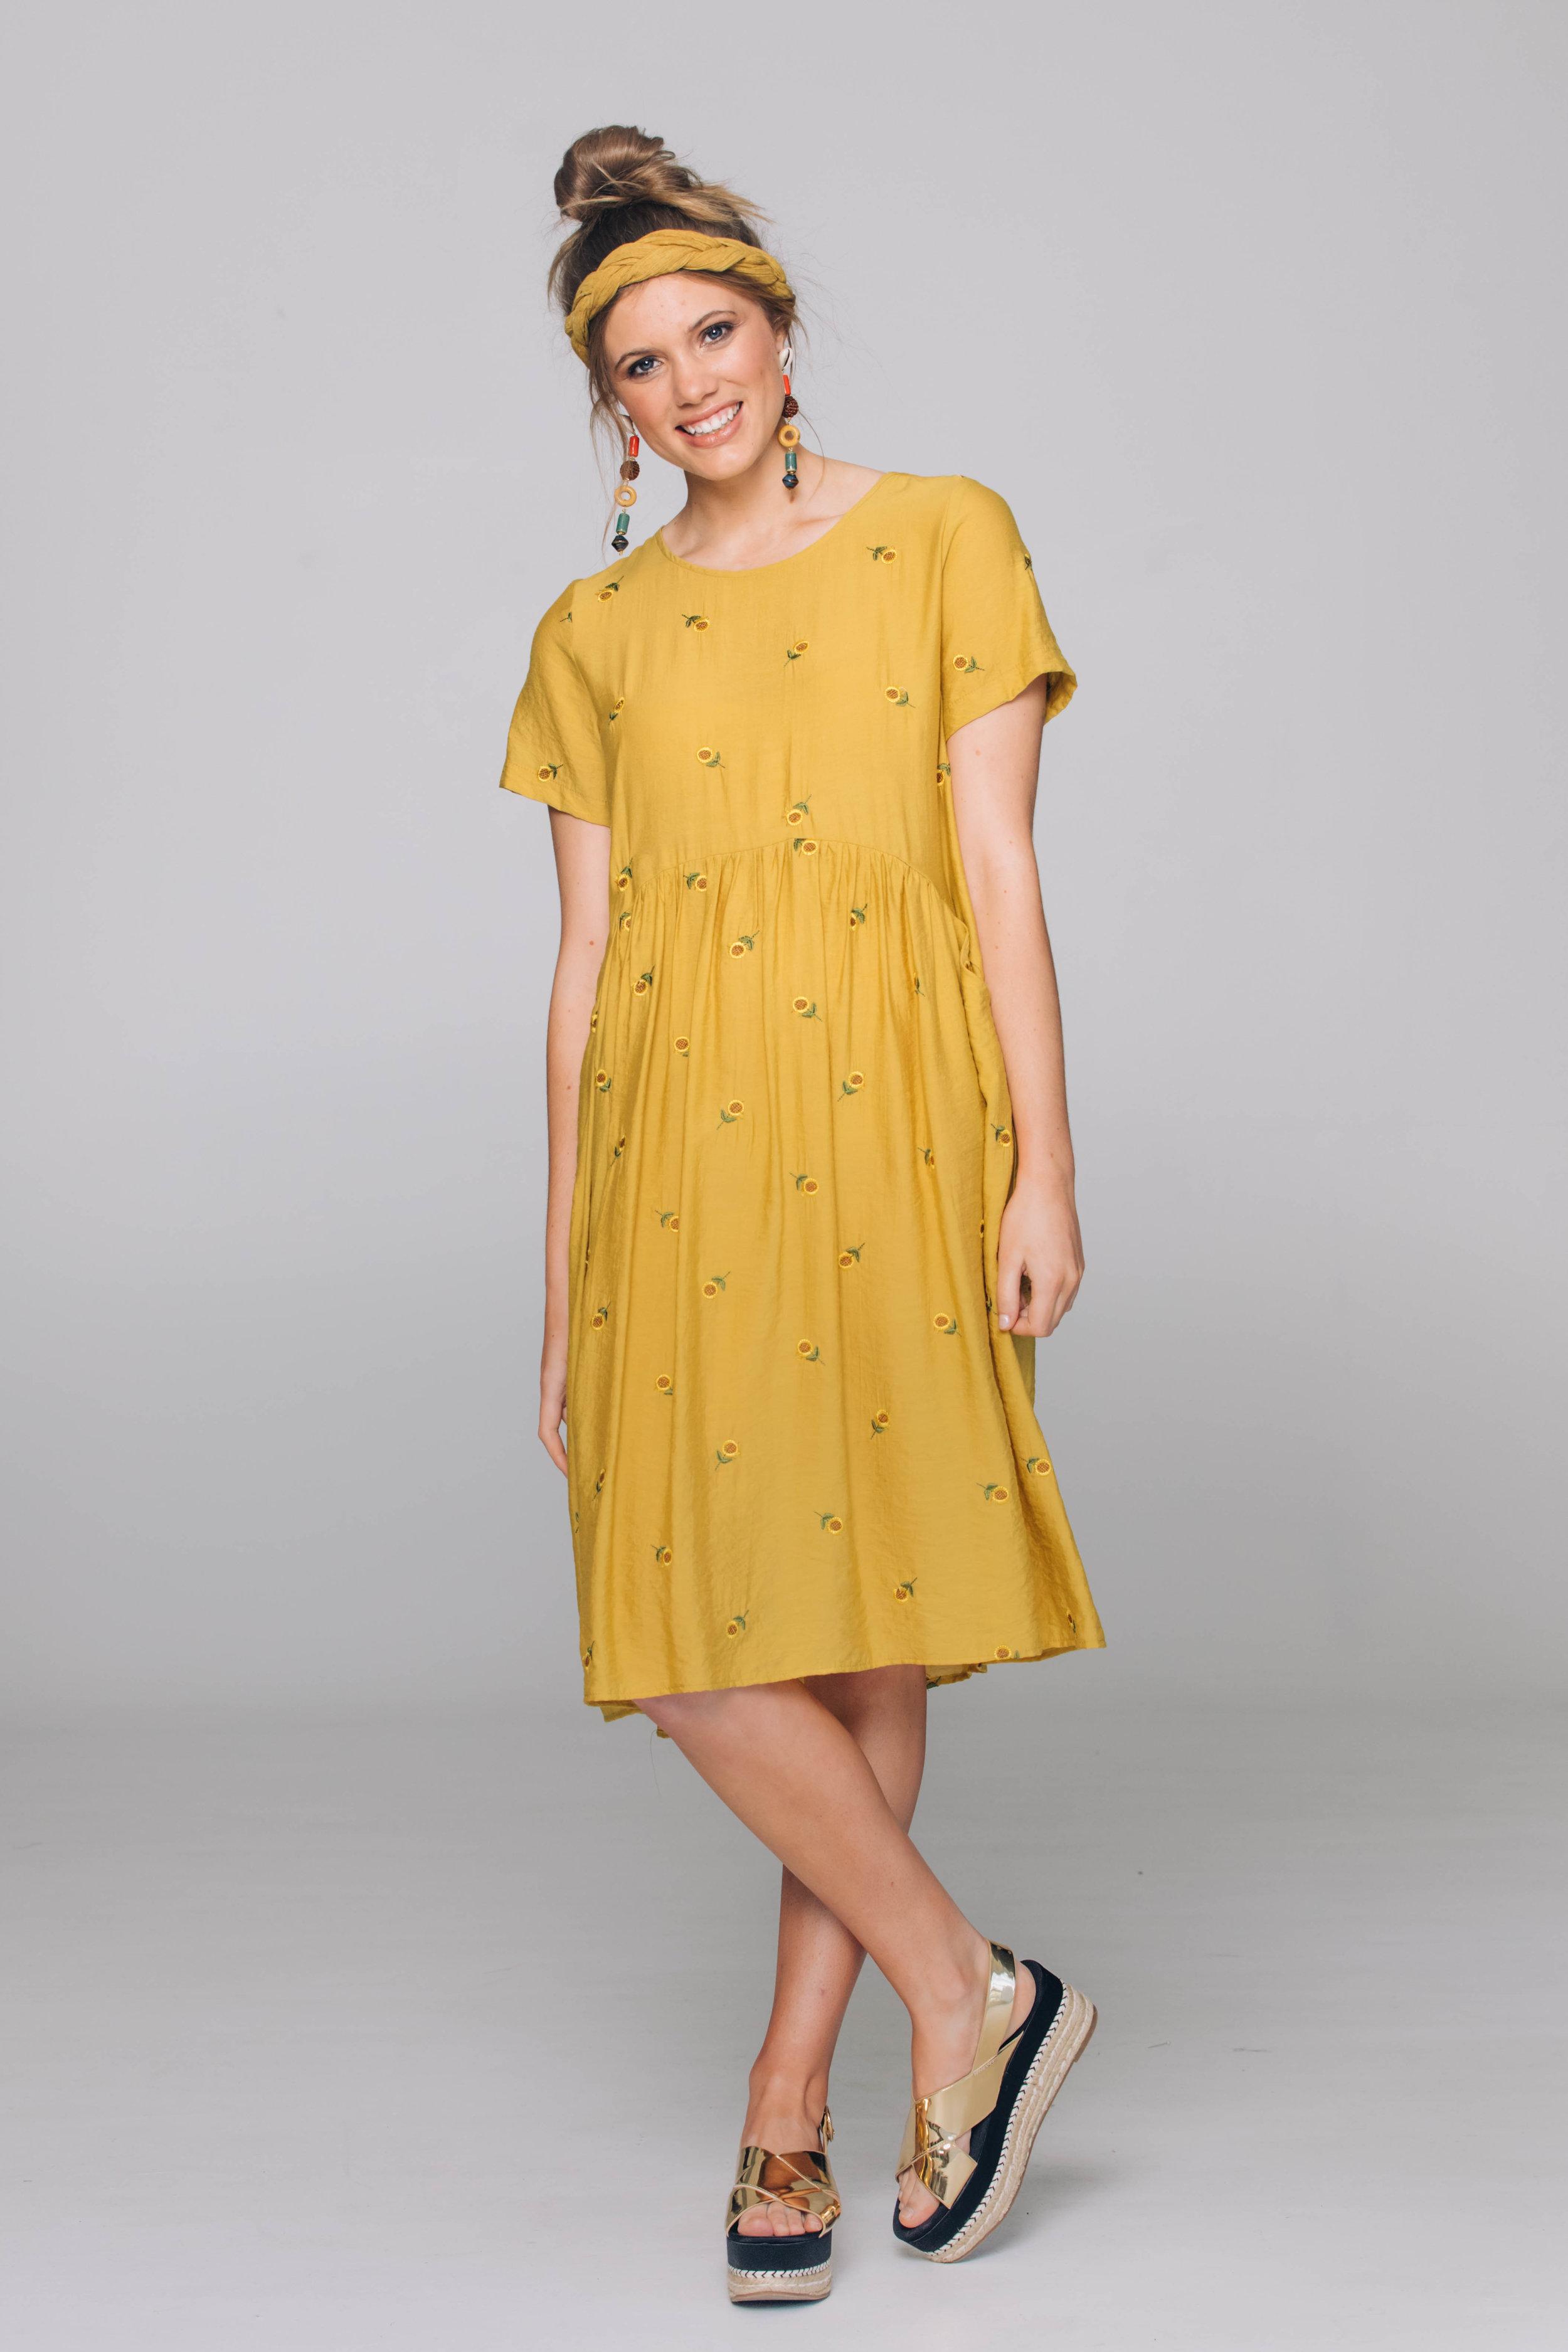 6177T Venice Dress, Suzu Sunflower Mustard